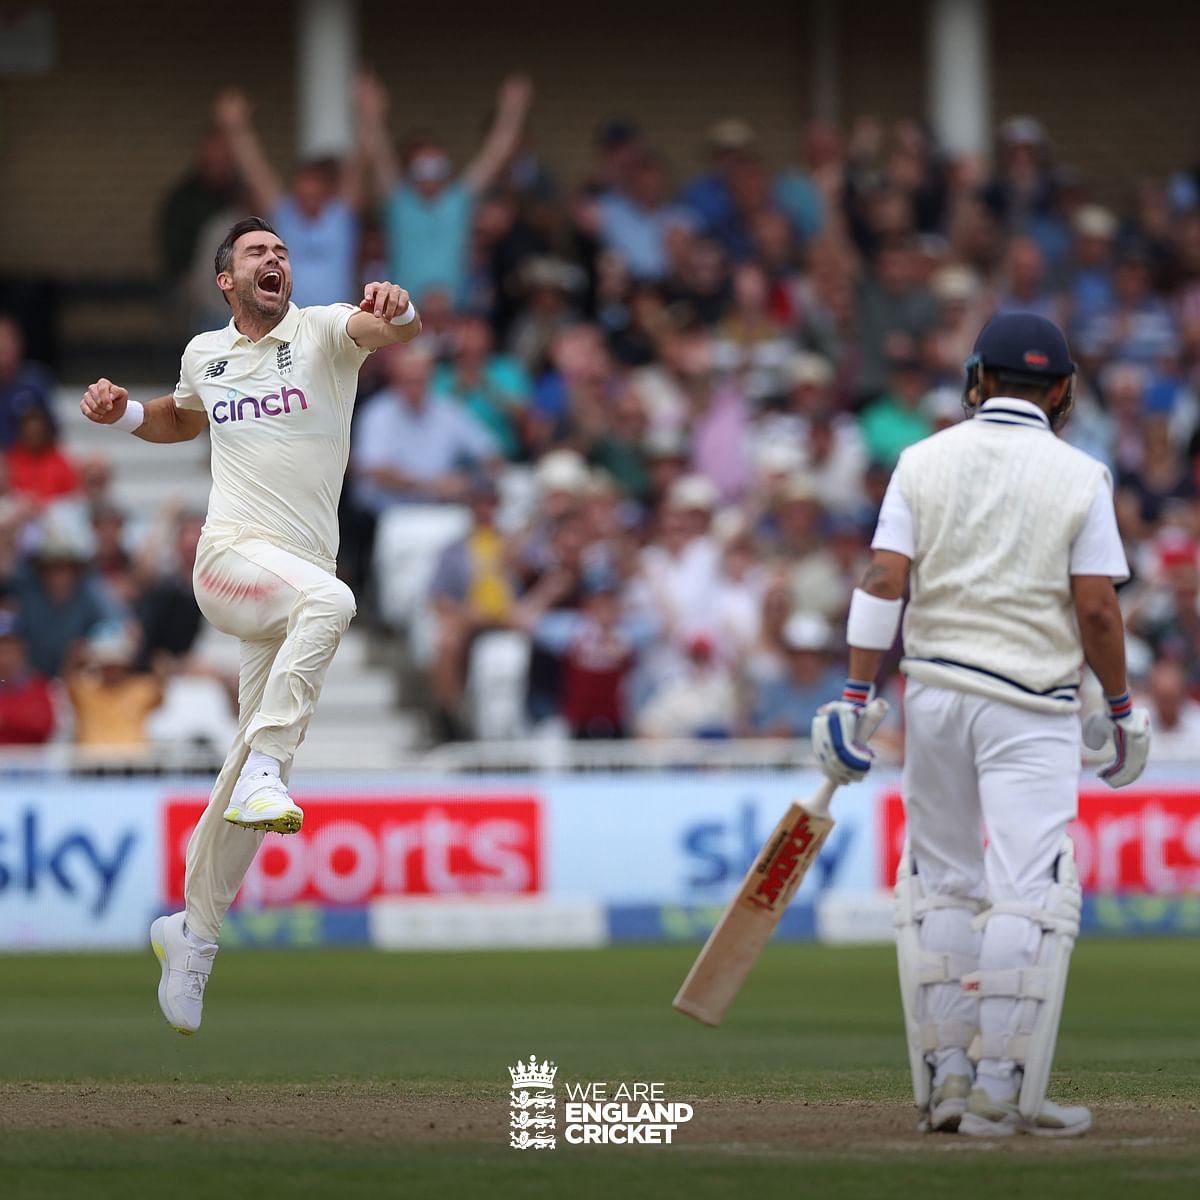 IND vs ENG, 1st Test: Virat Kohli records most golden ducks for Indian Test captains; watch video